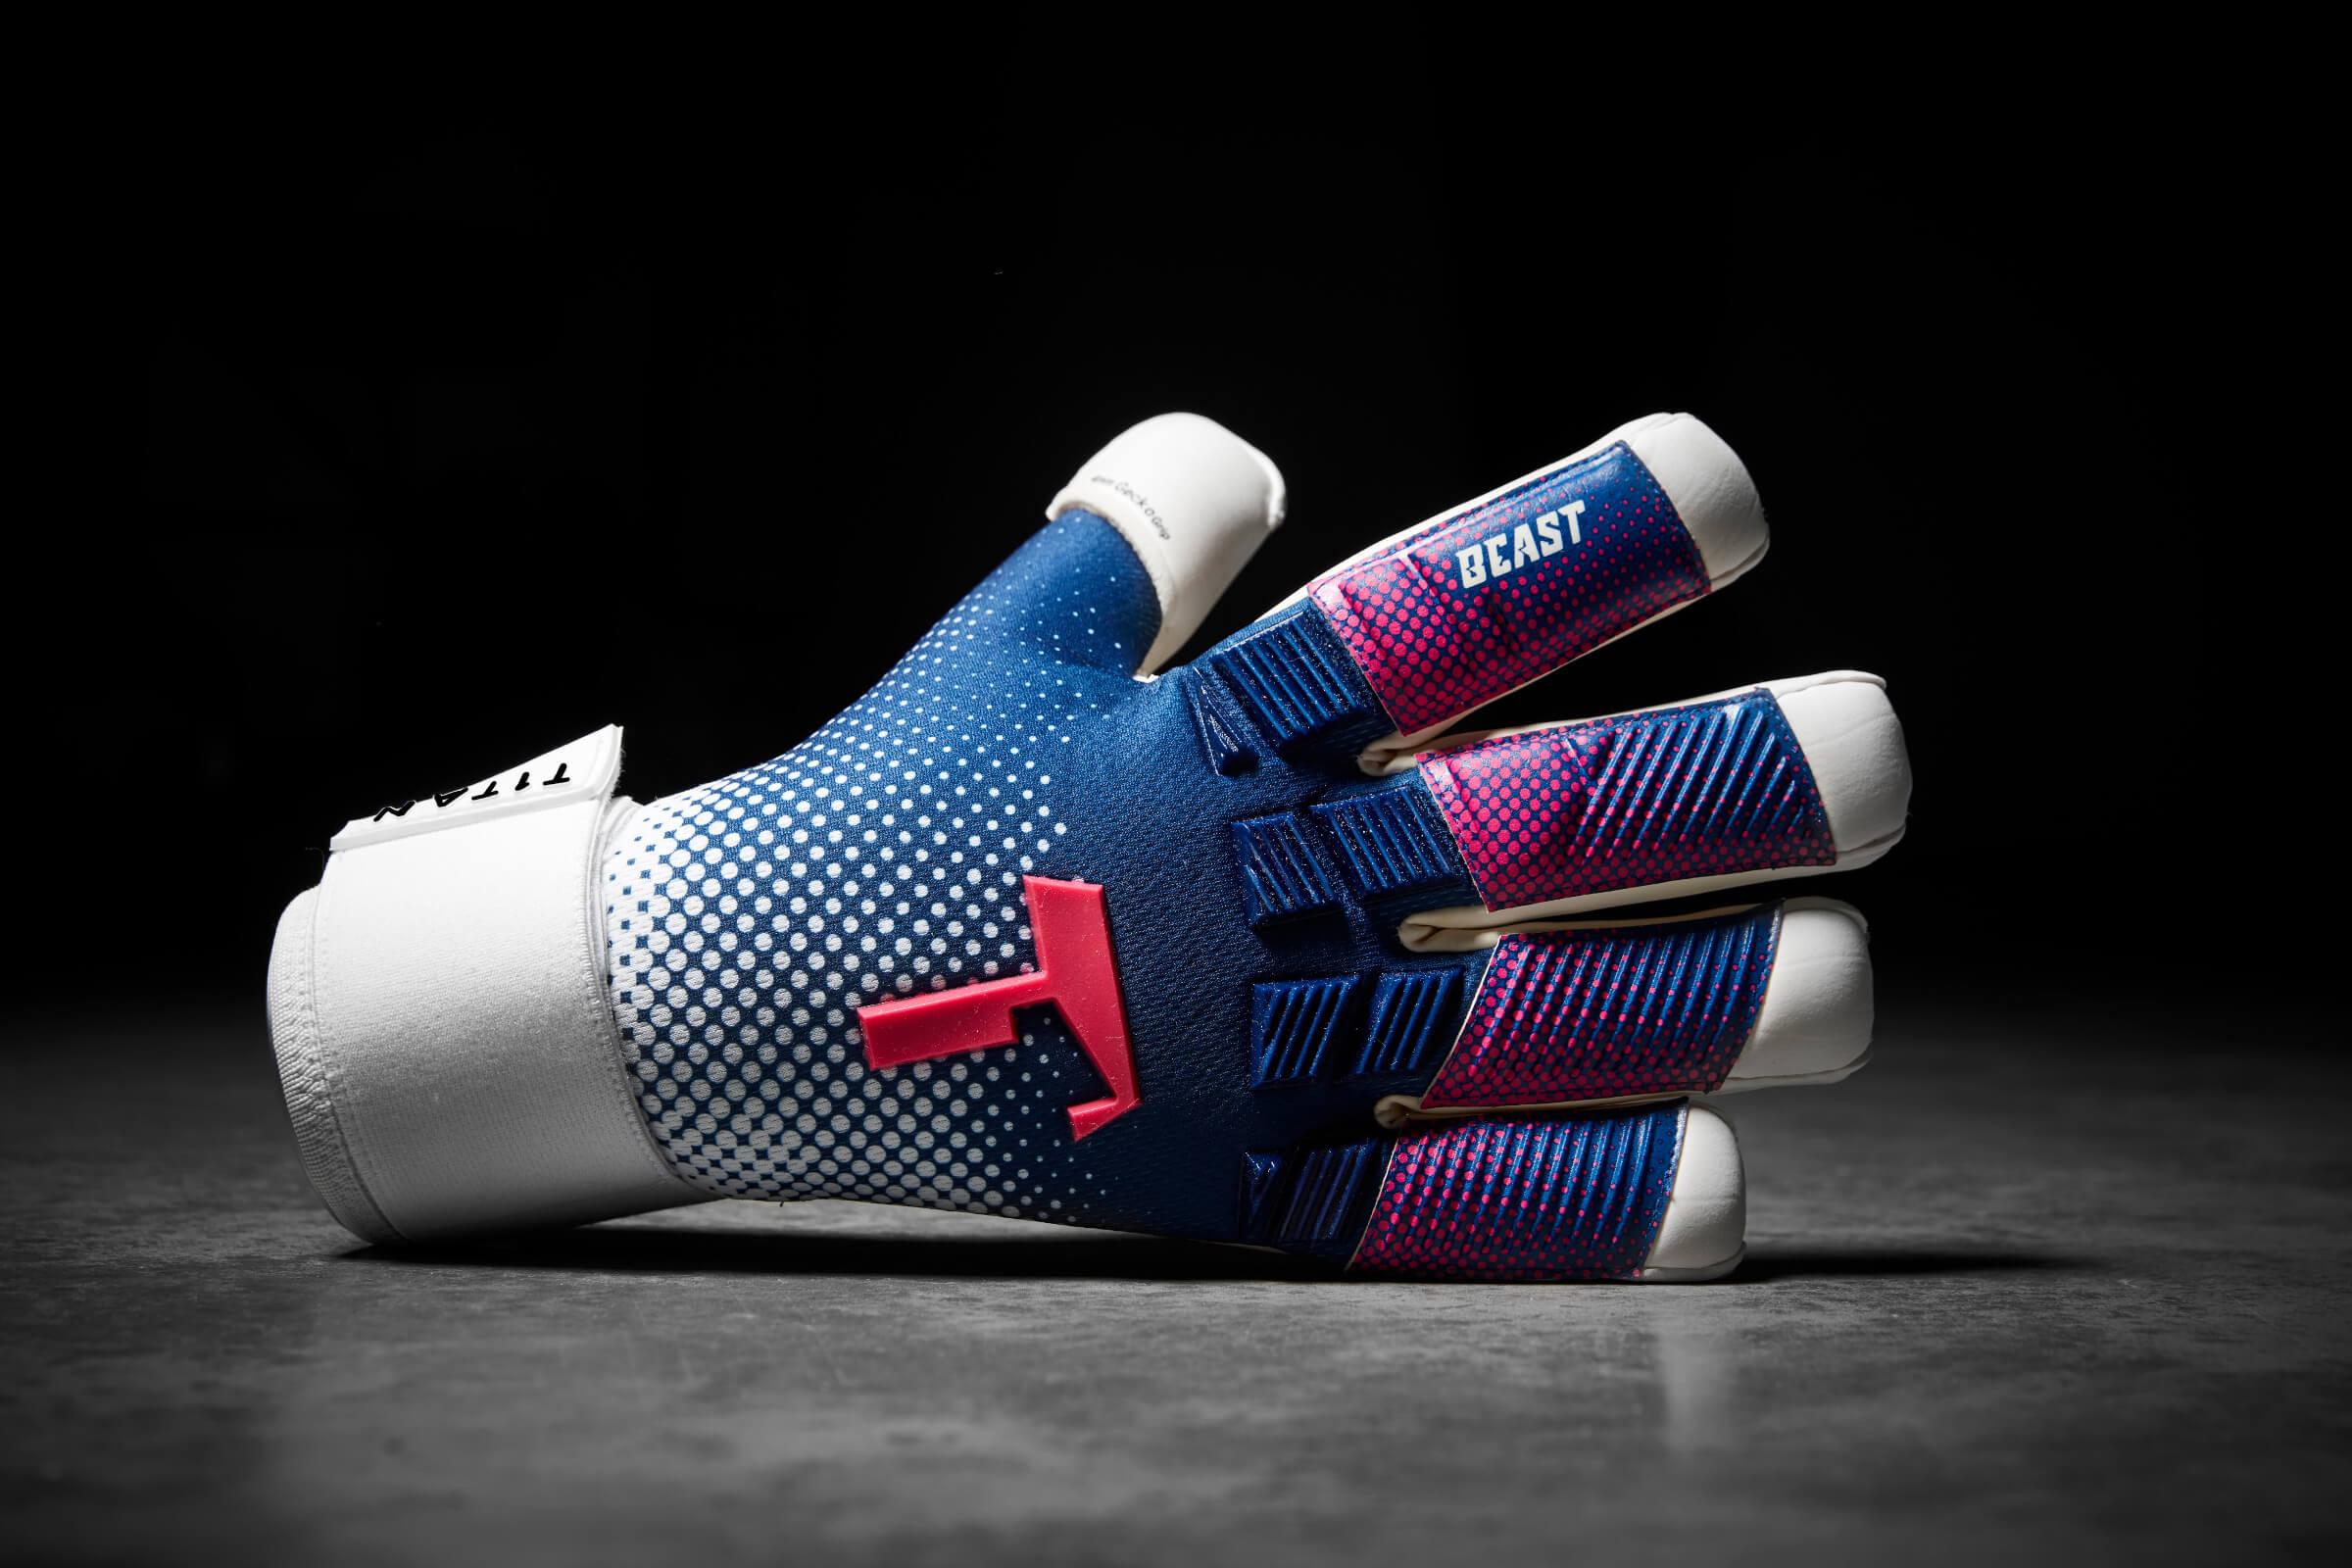 Blue Beast Professional Goalkeeper Gloves Bethebeast